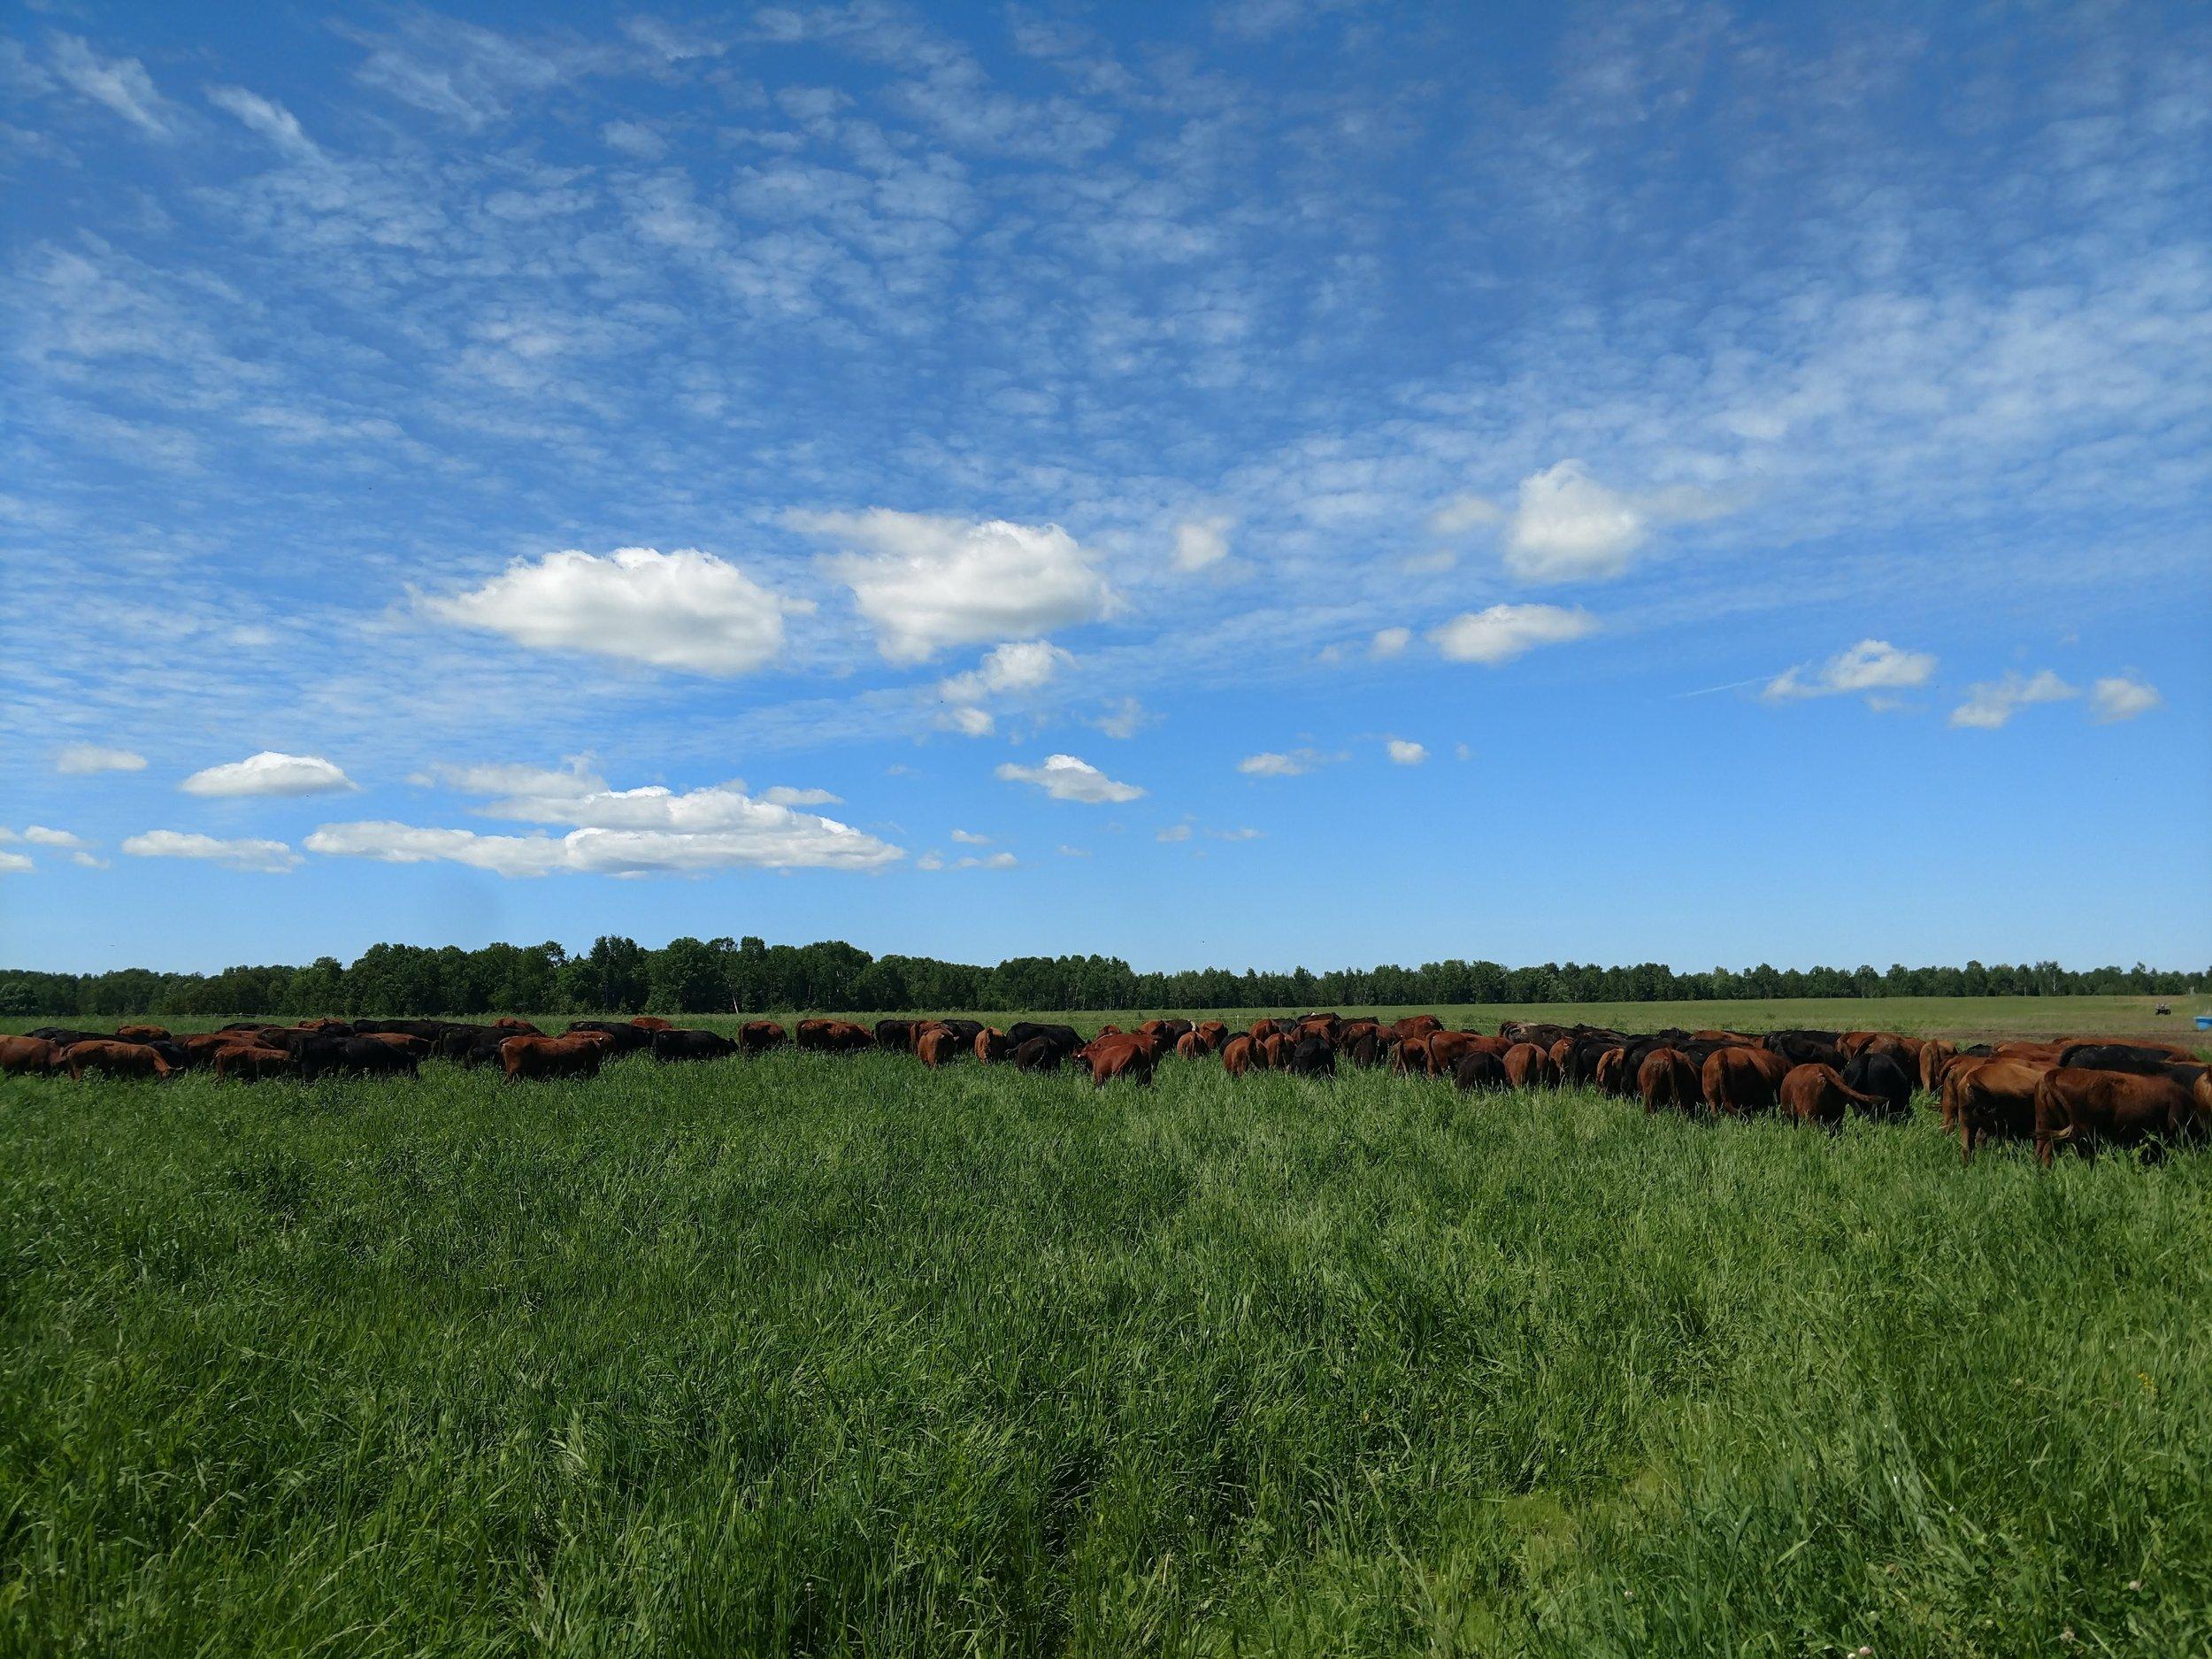 Sweeten Farms - Cattle enjoying beautiful pasture on a beautiful day in the U.P. of Michigan